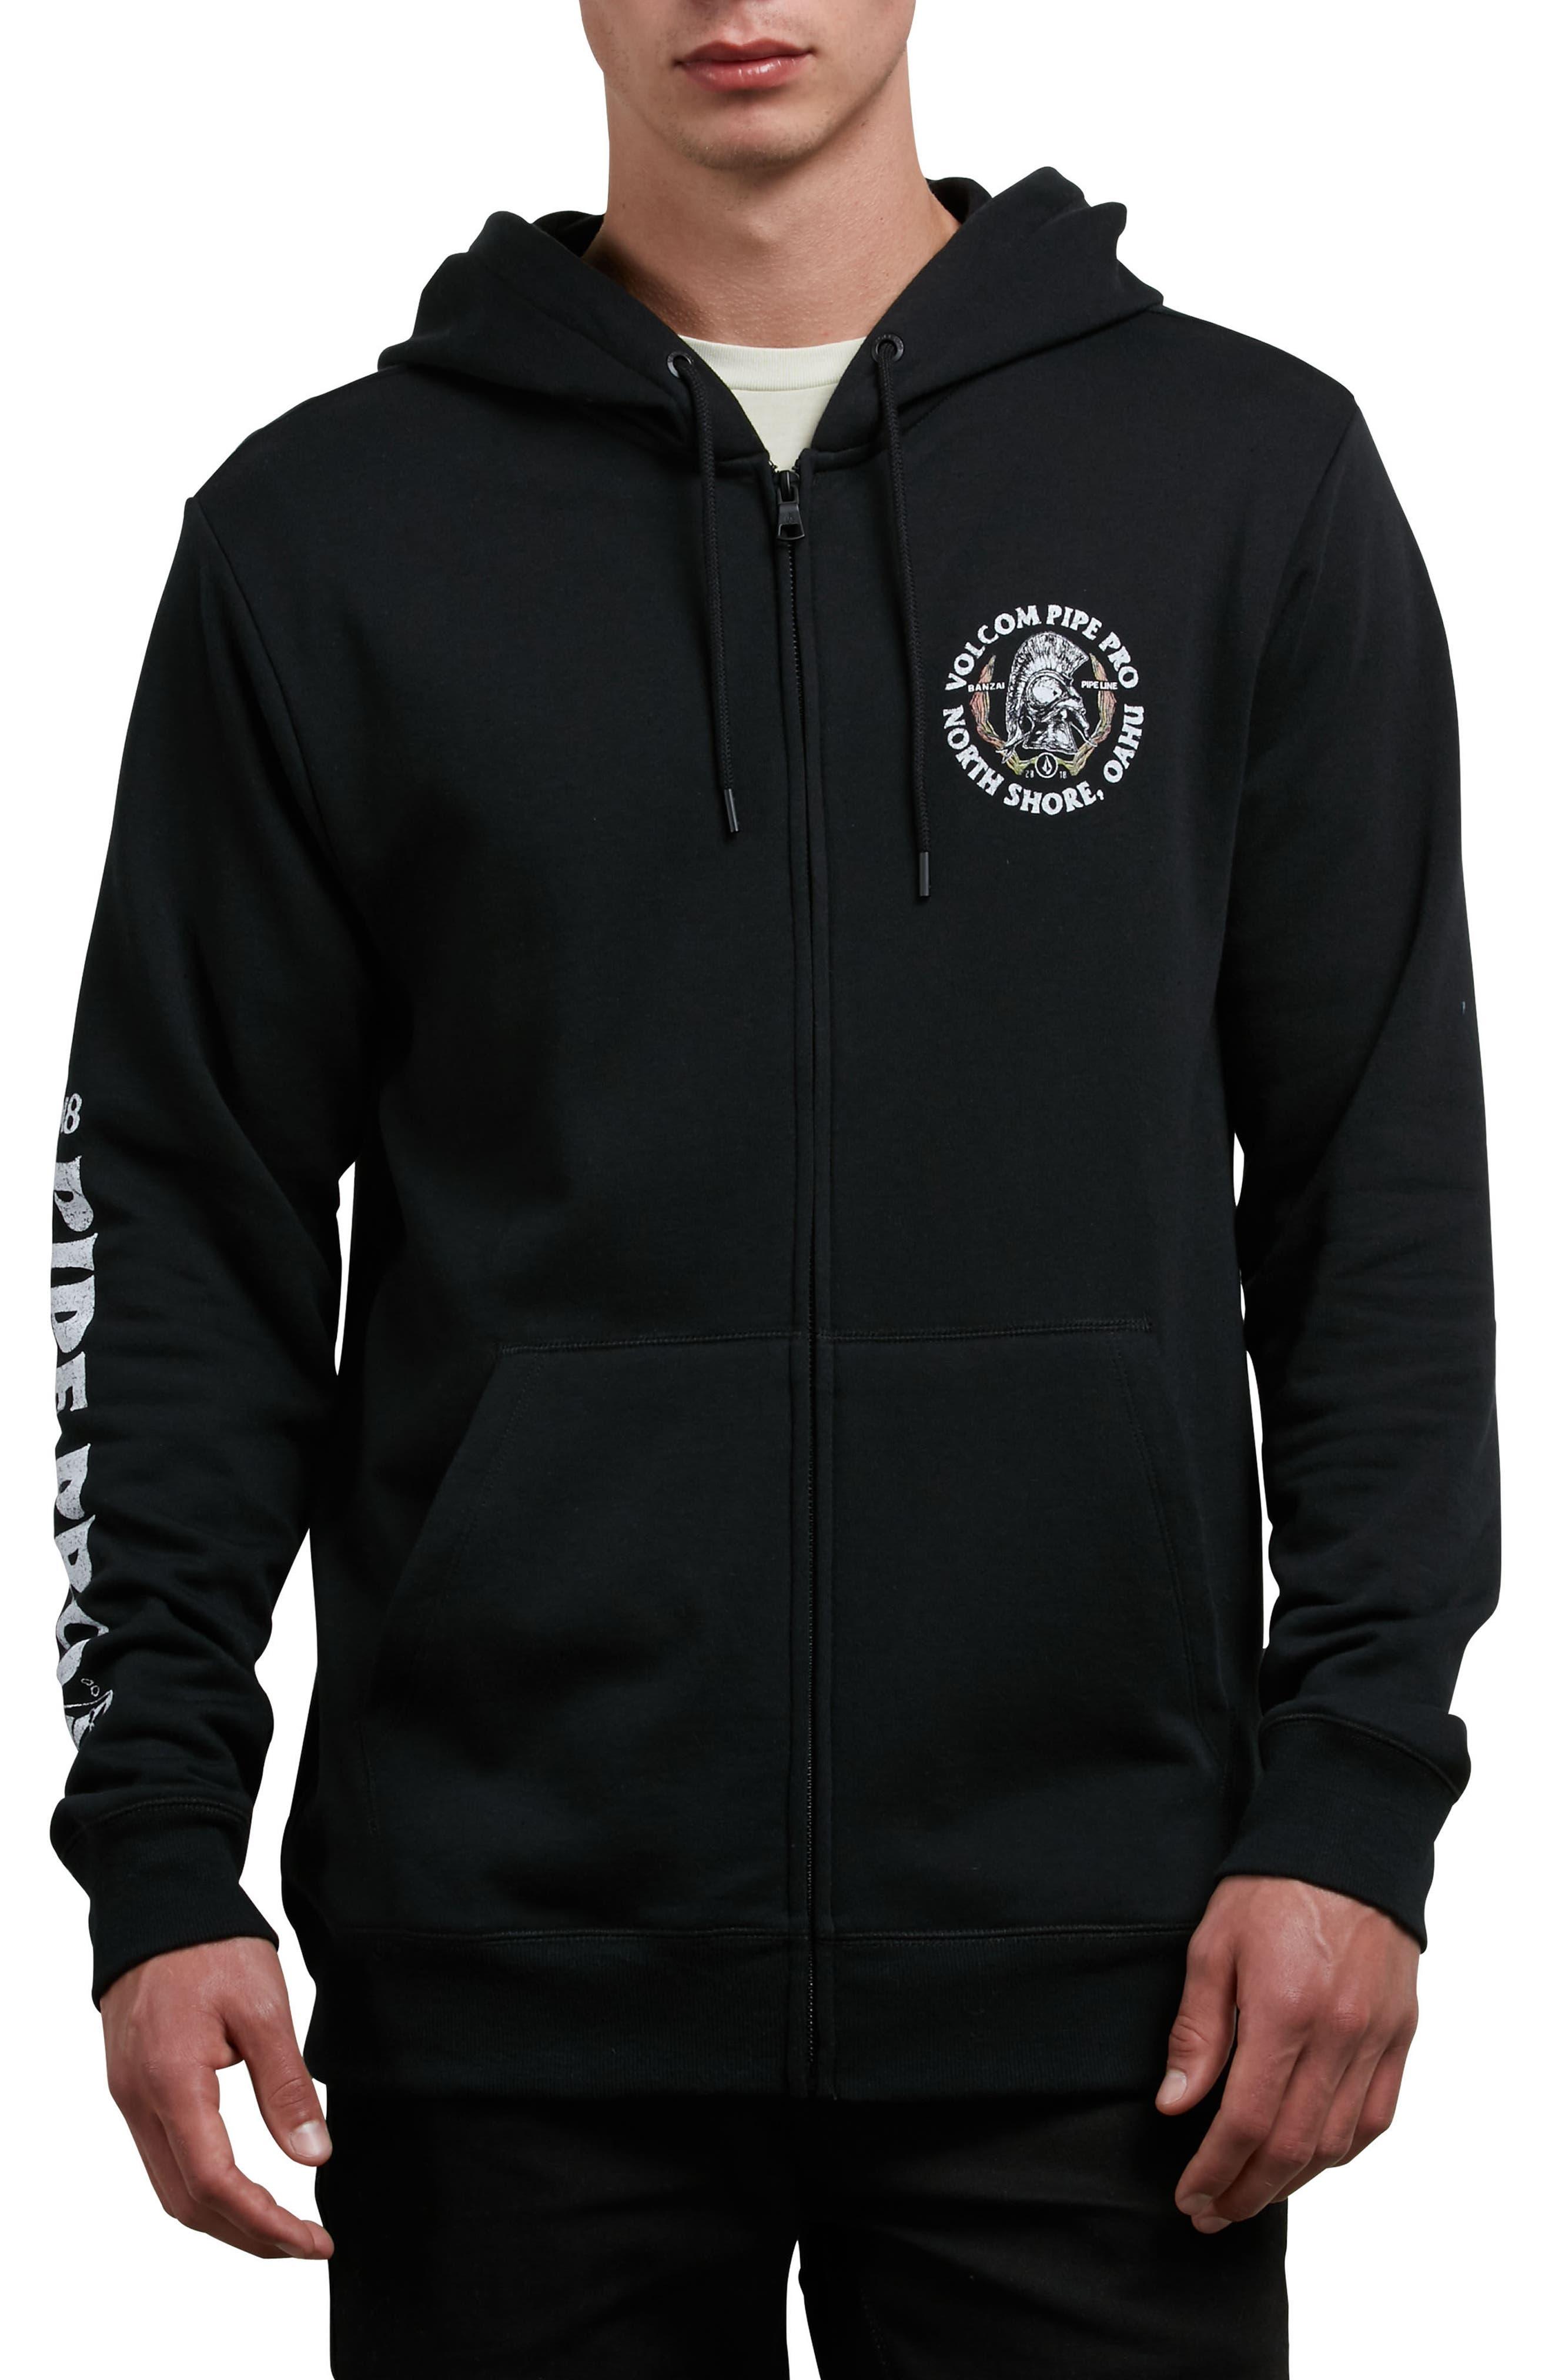 Pipe Pro Seal Graphic Zip Hoodie,                         Main,                         color, Black